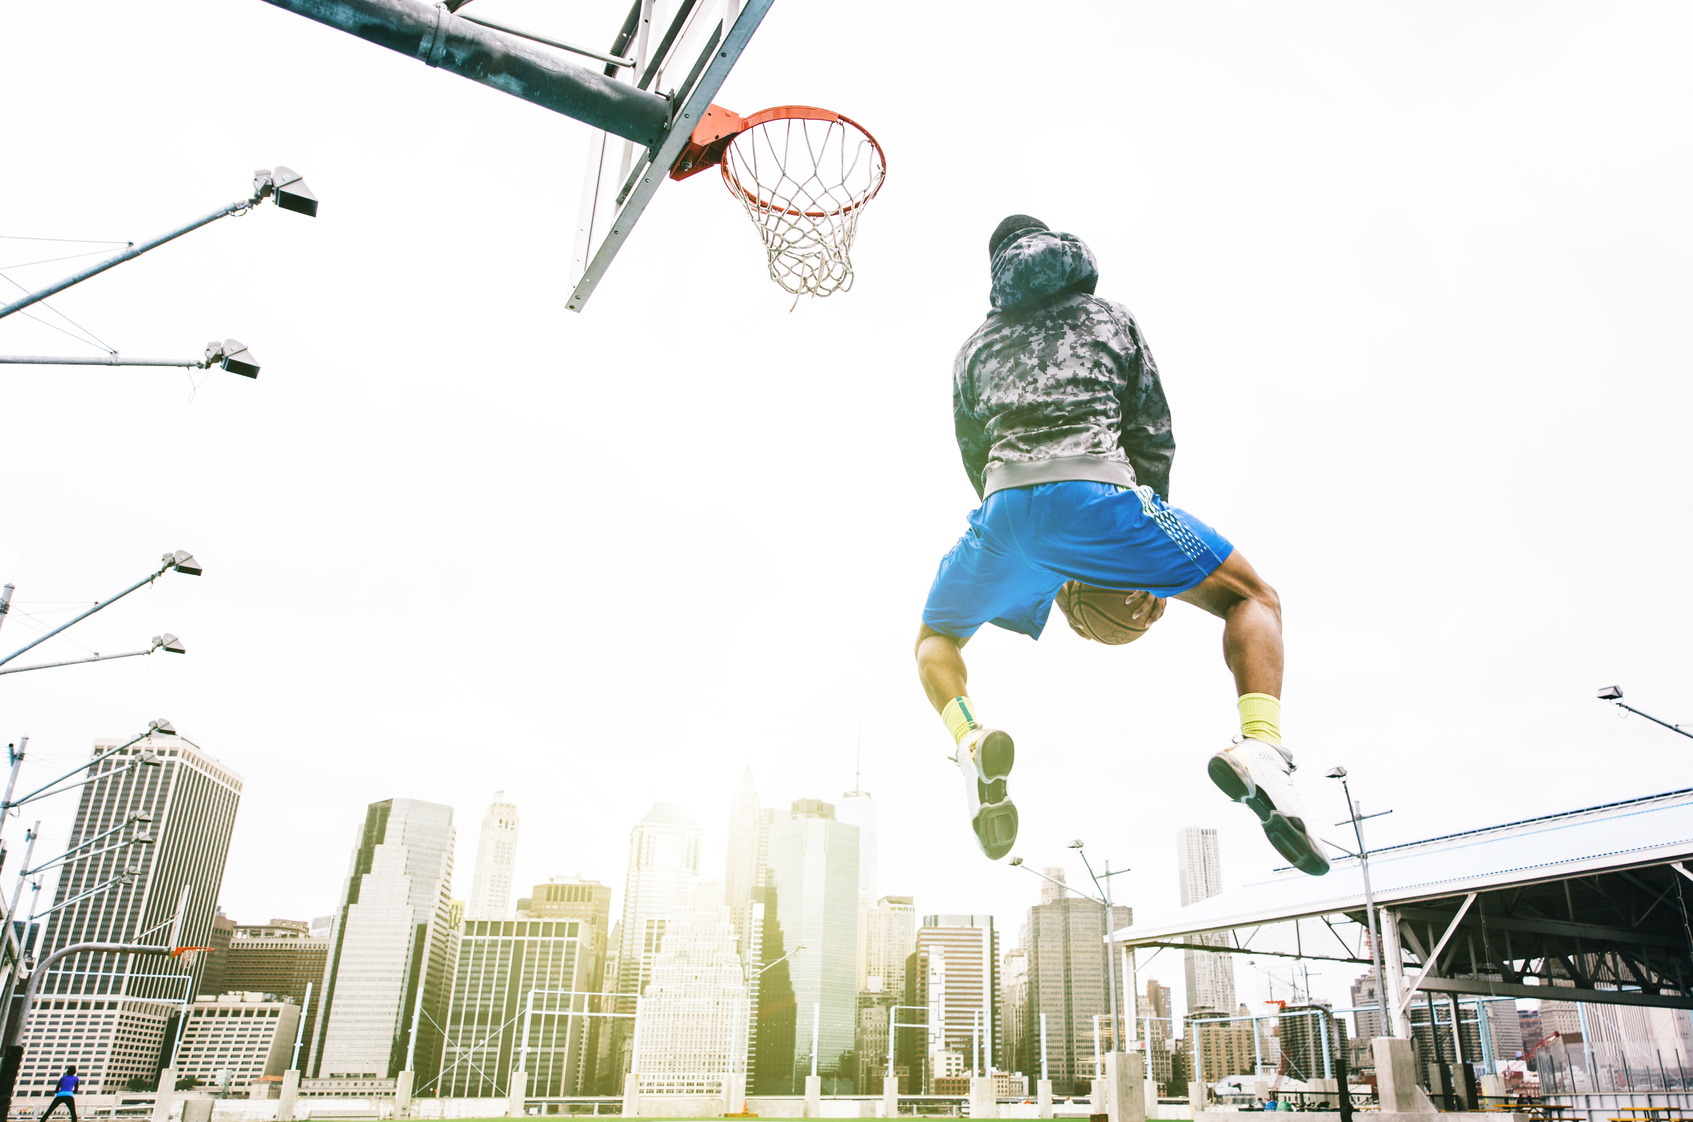 Street basketball player performing an huge rear slam dunk. New york Manhattan buildings background